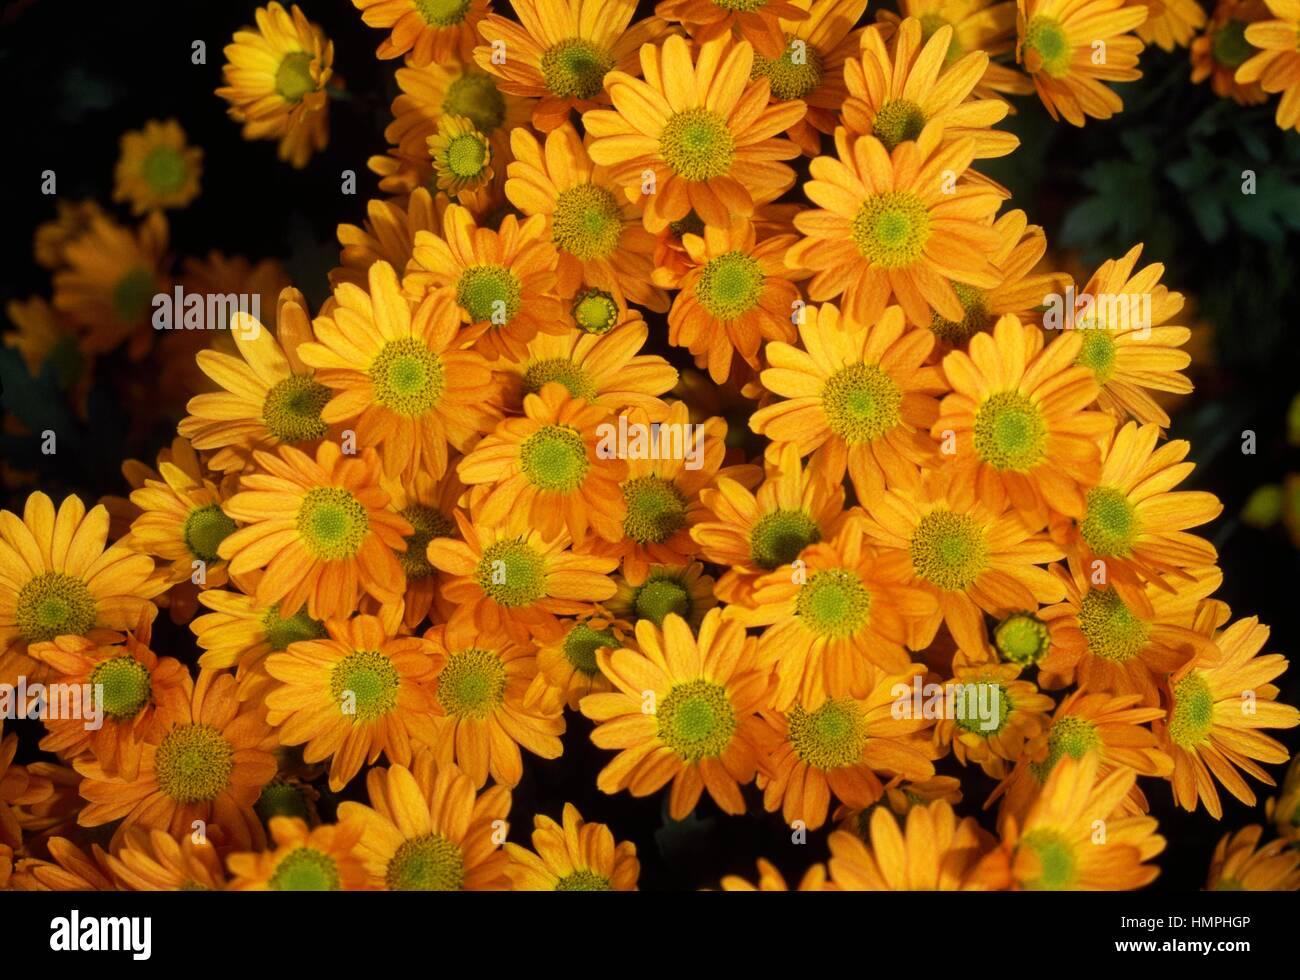 Mamme (crisantemo Allegro arancione), Asteraceae. Immagini Stock